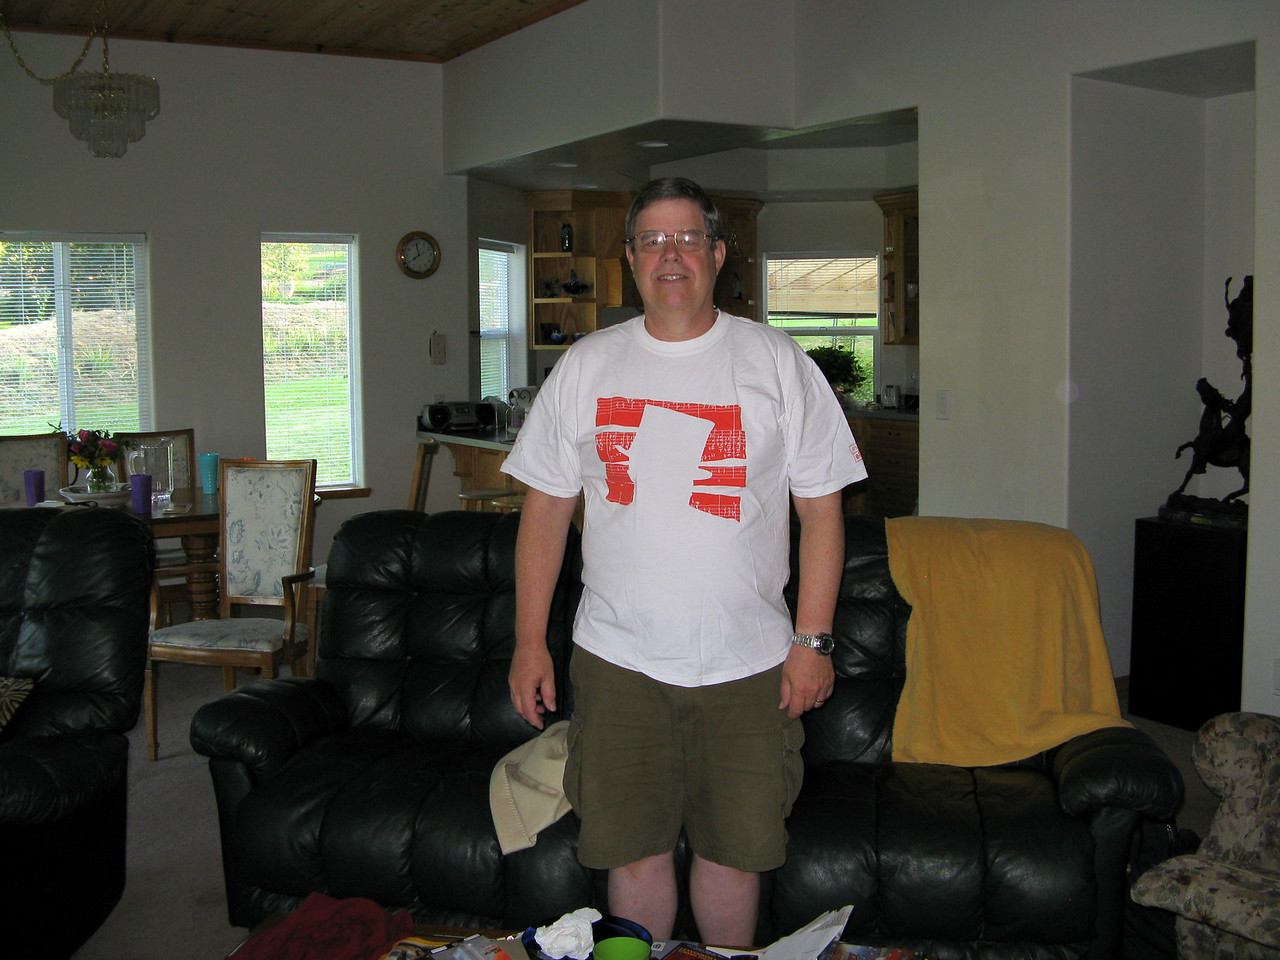 2012-08-19 Lvnwrth 002